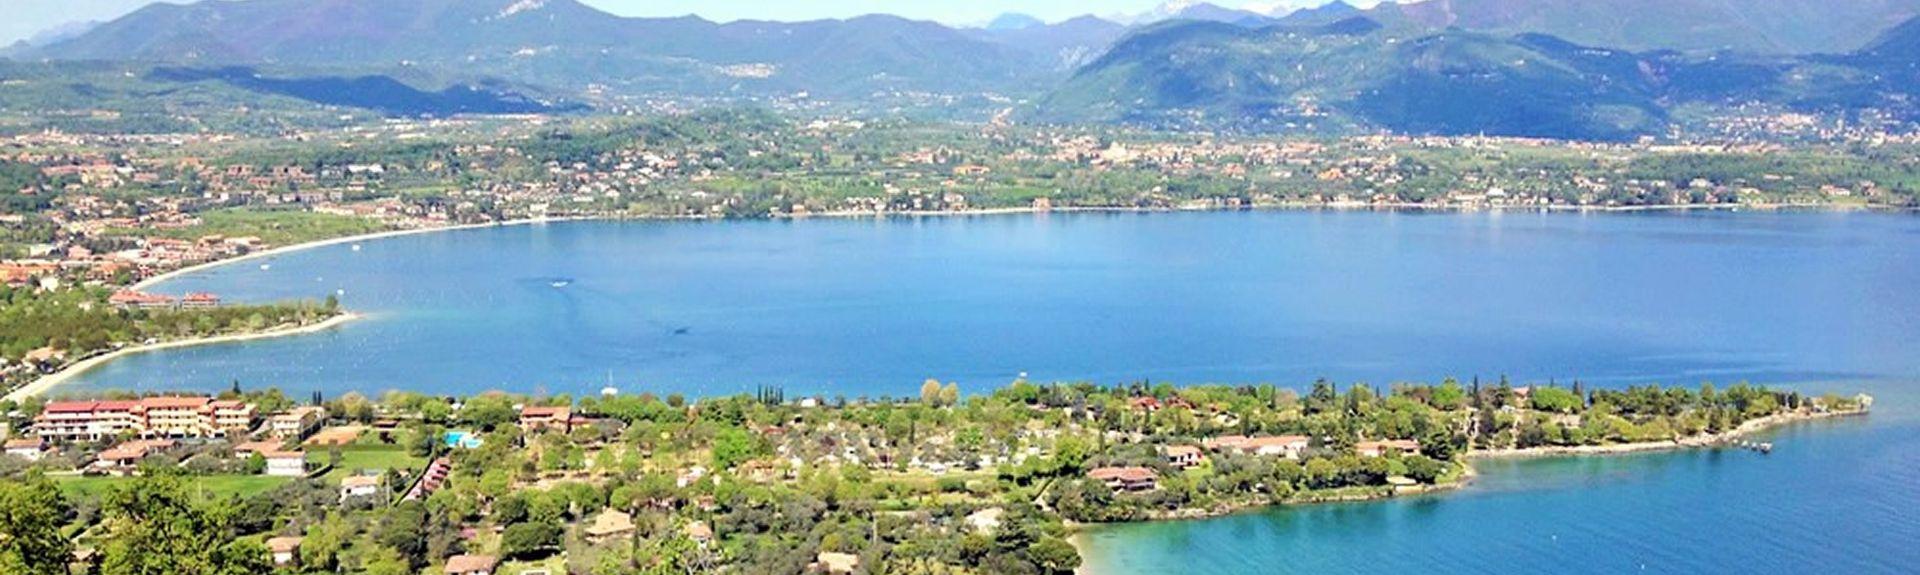 Cecina BS, Brescia, Lombardy, Italy